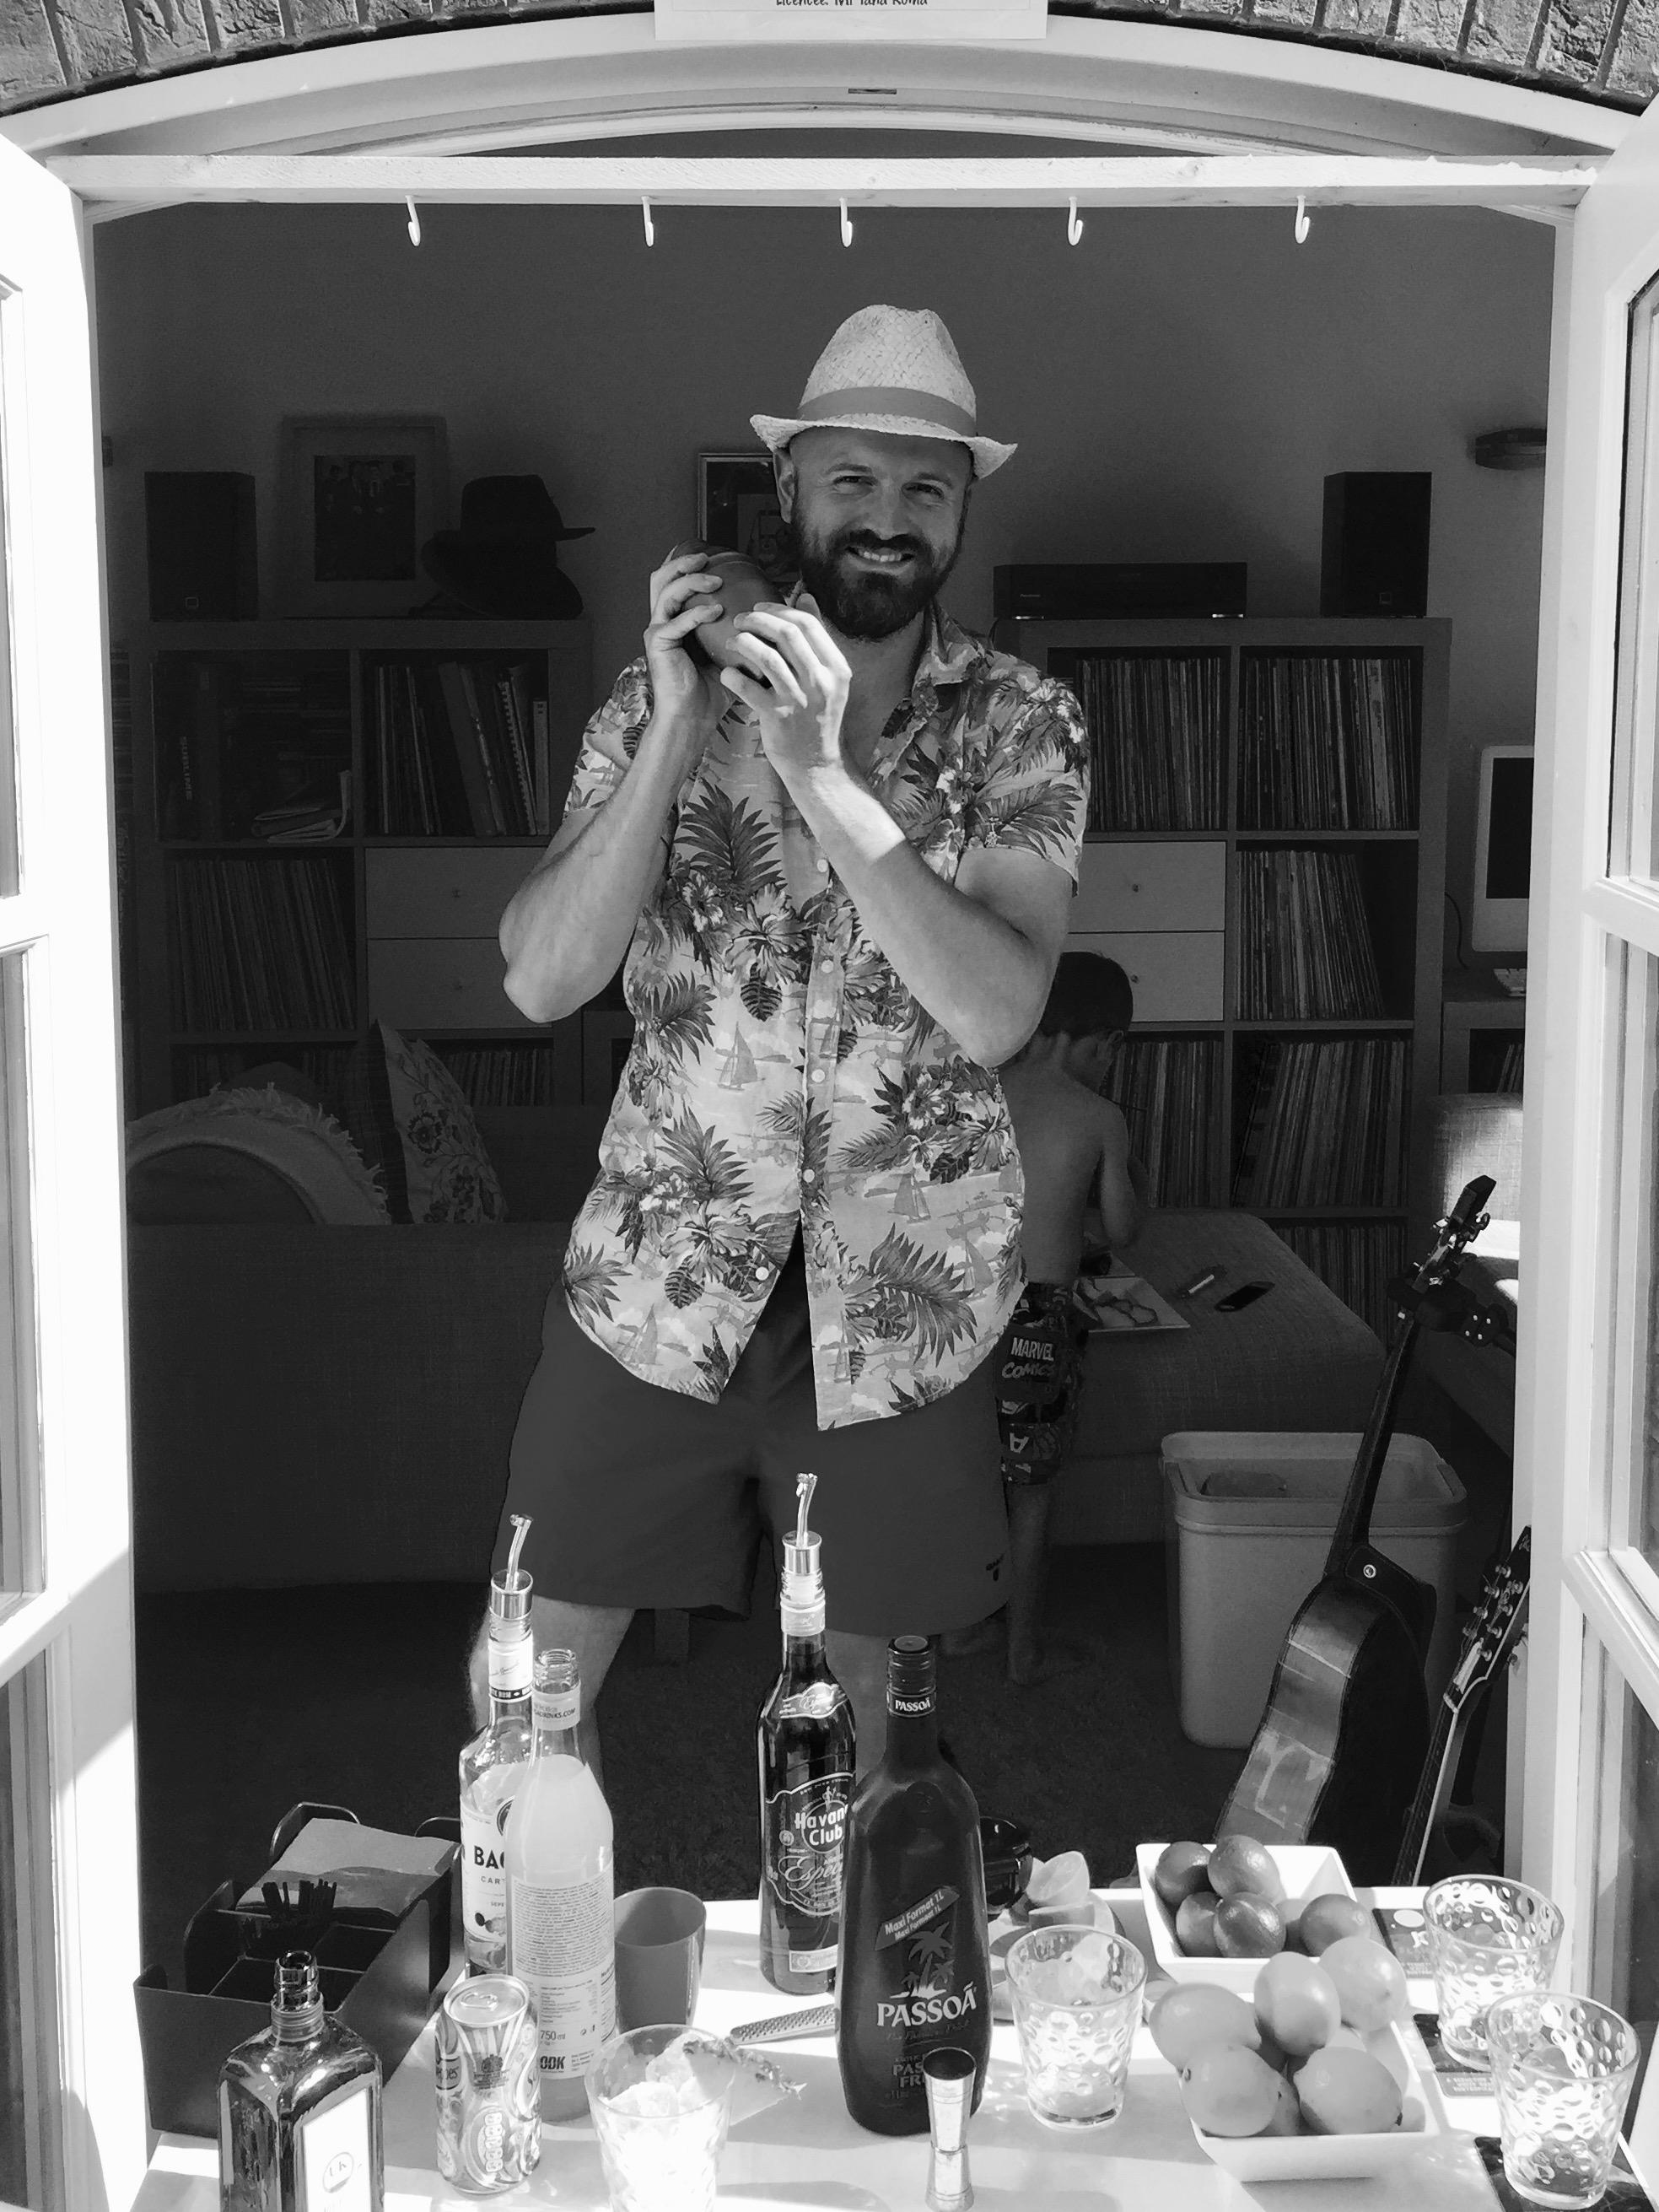 Ian Thomas, aka  @morethanadad ,The Mother Hub's resident mixologist!